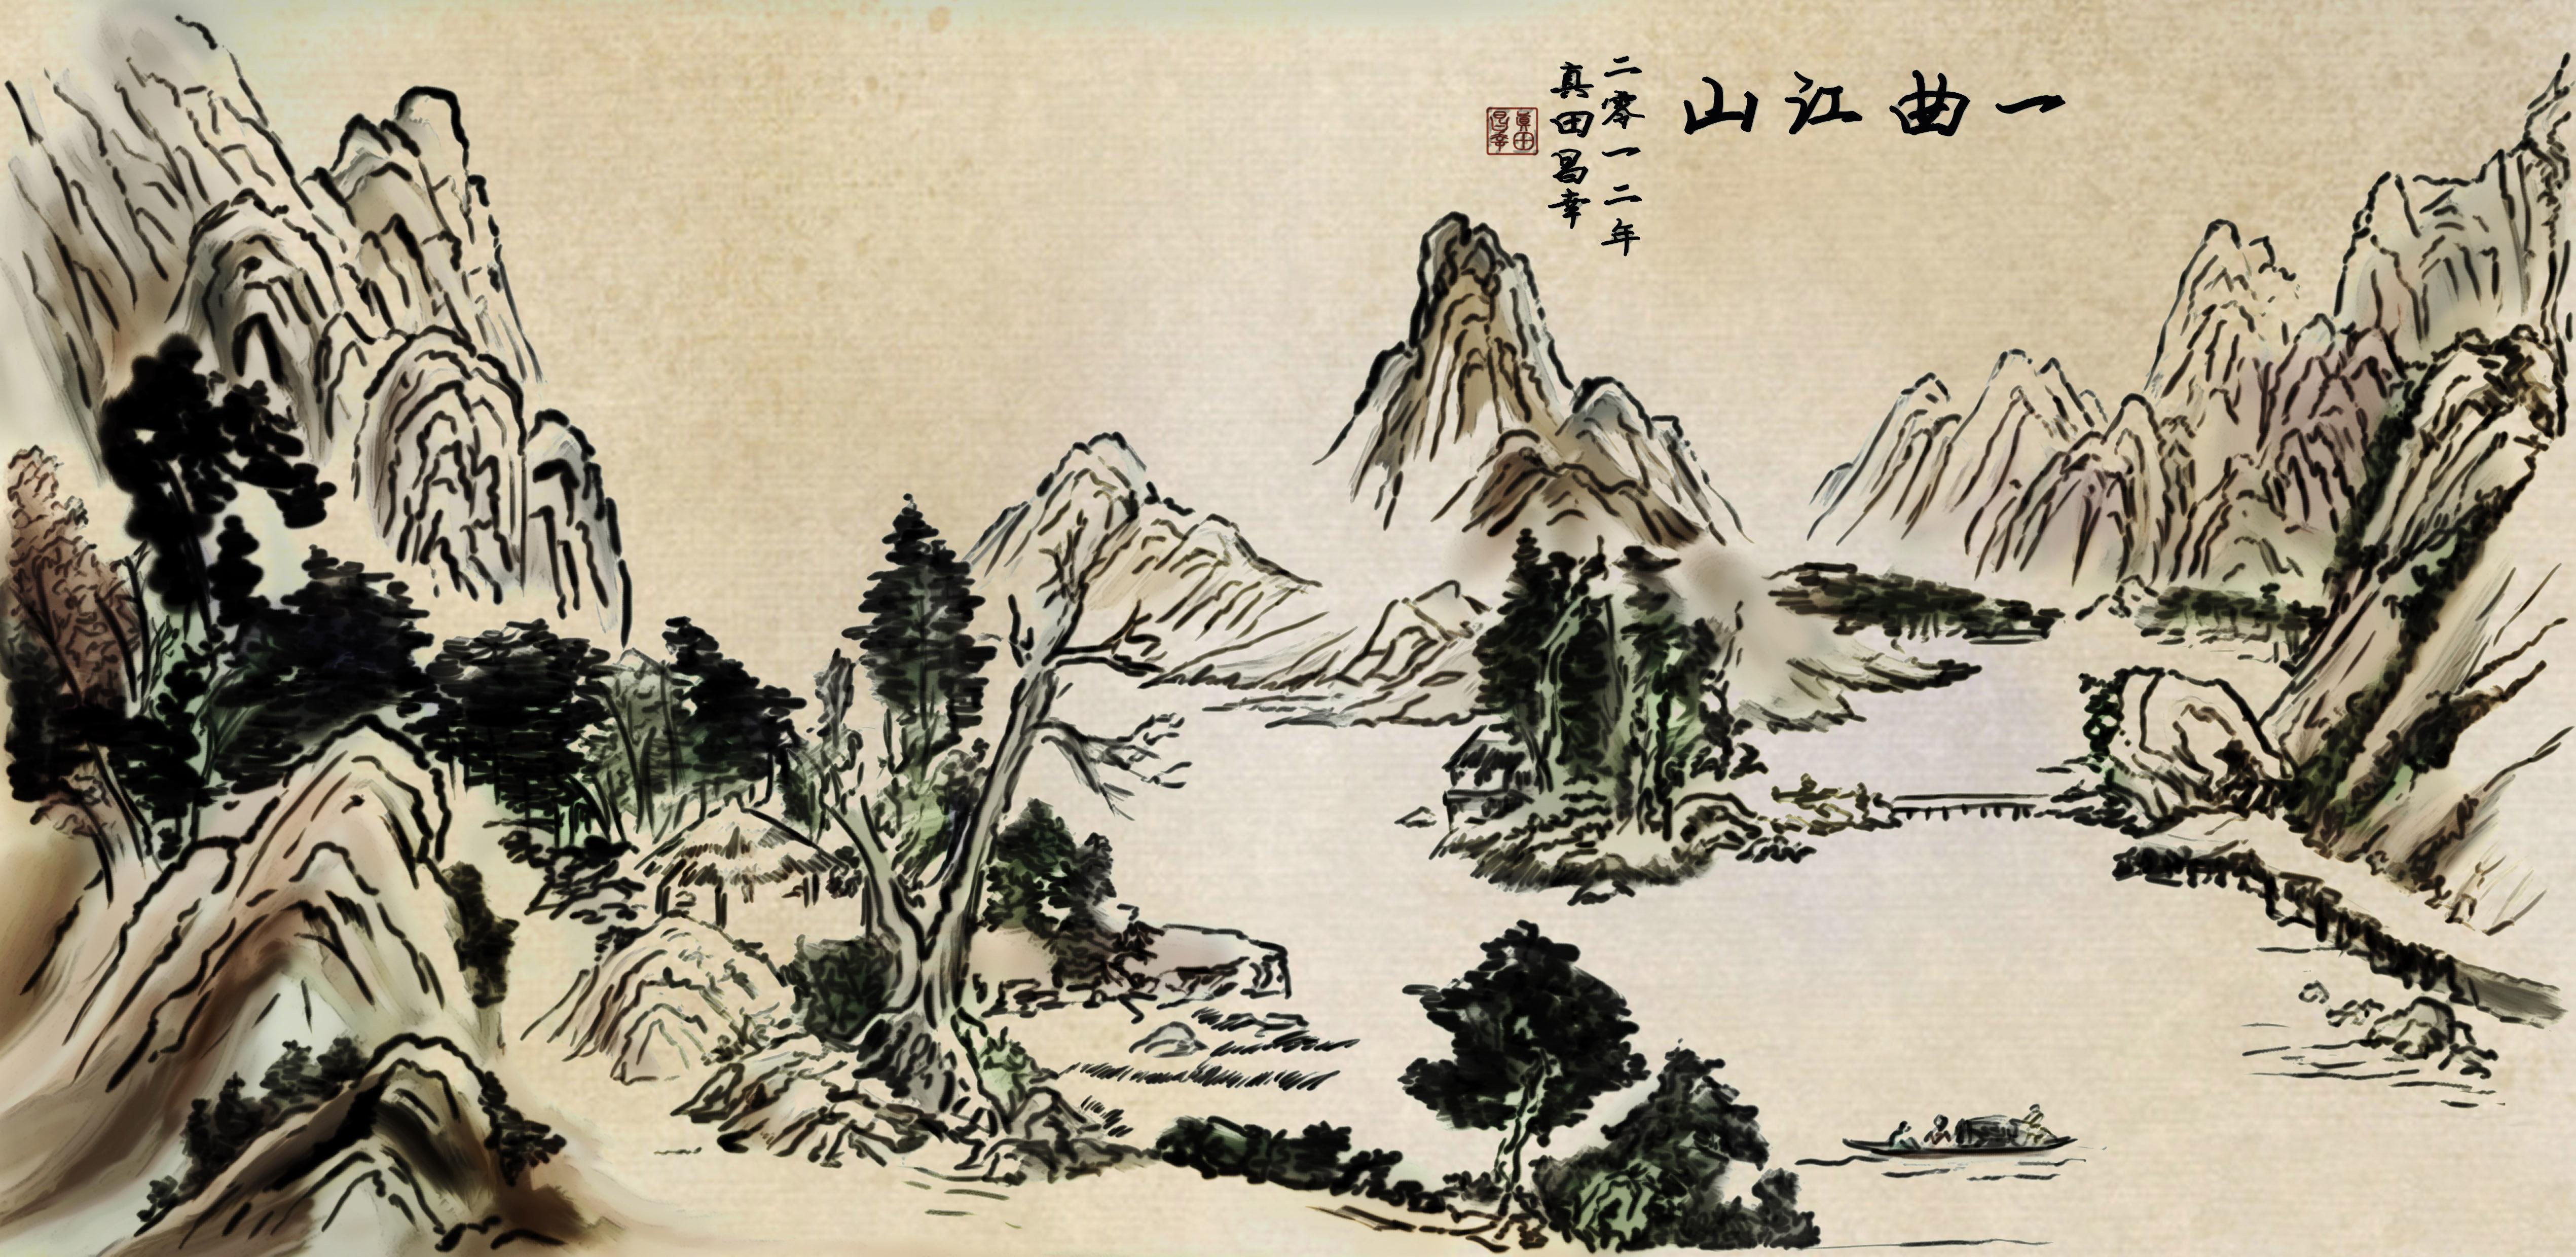 Eastern Scenery